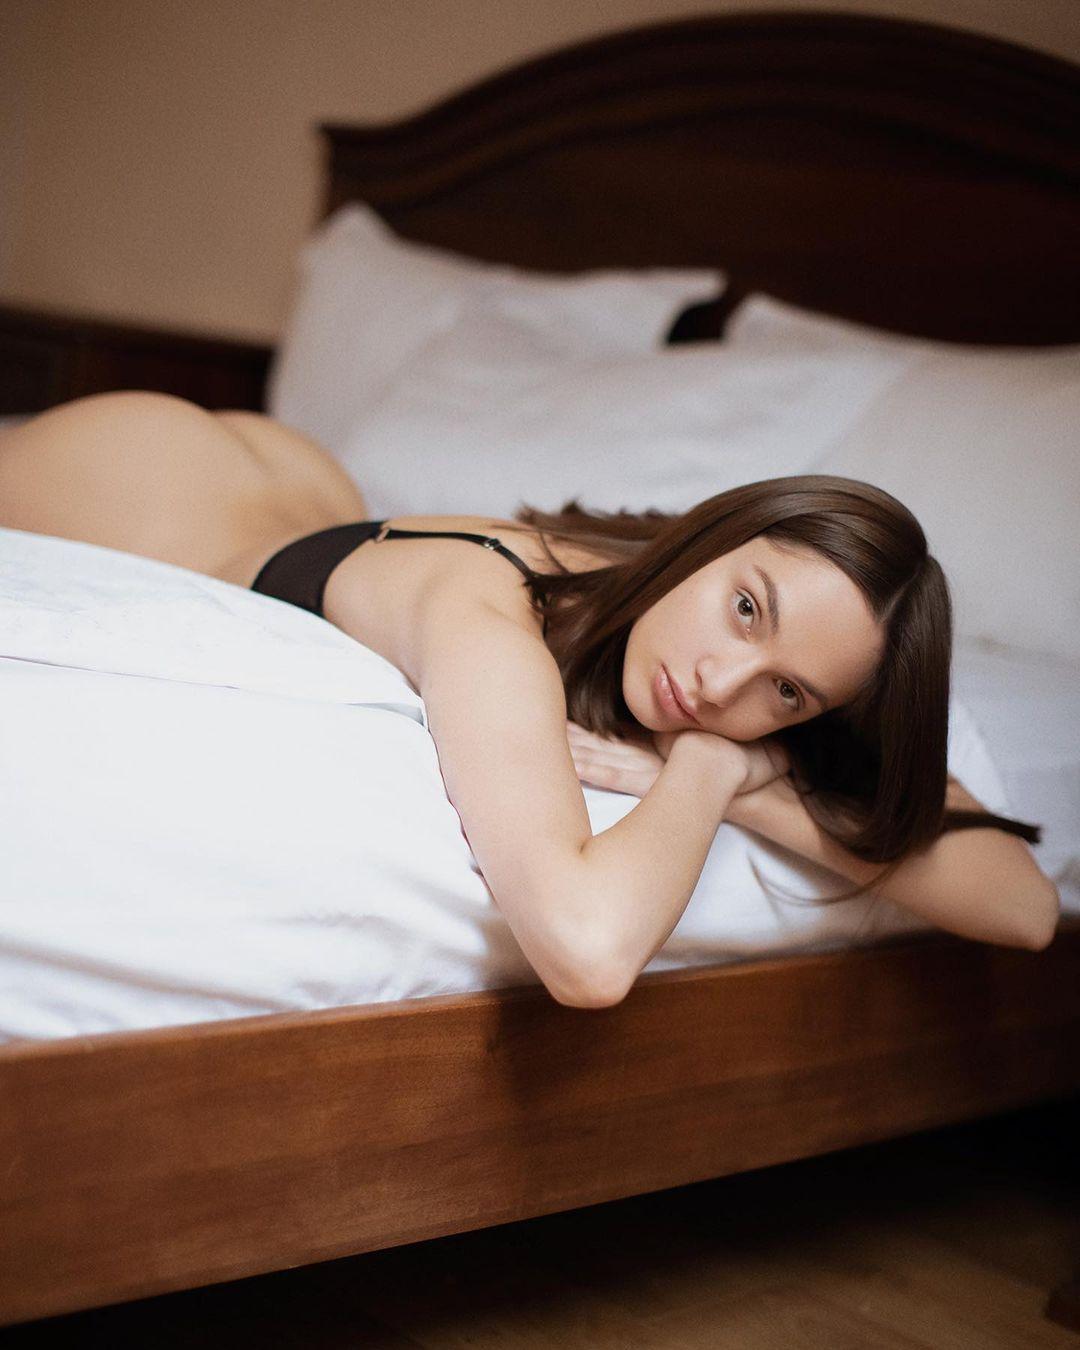 Margarita Danilovna - Max Zadorozhny photoshoot